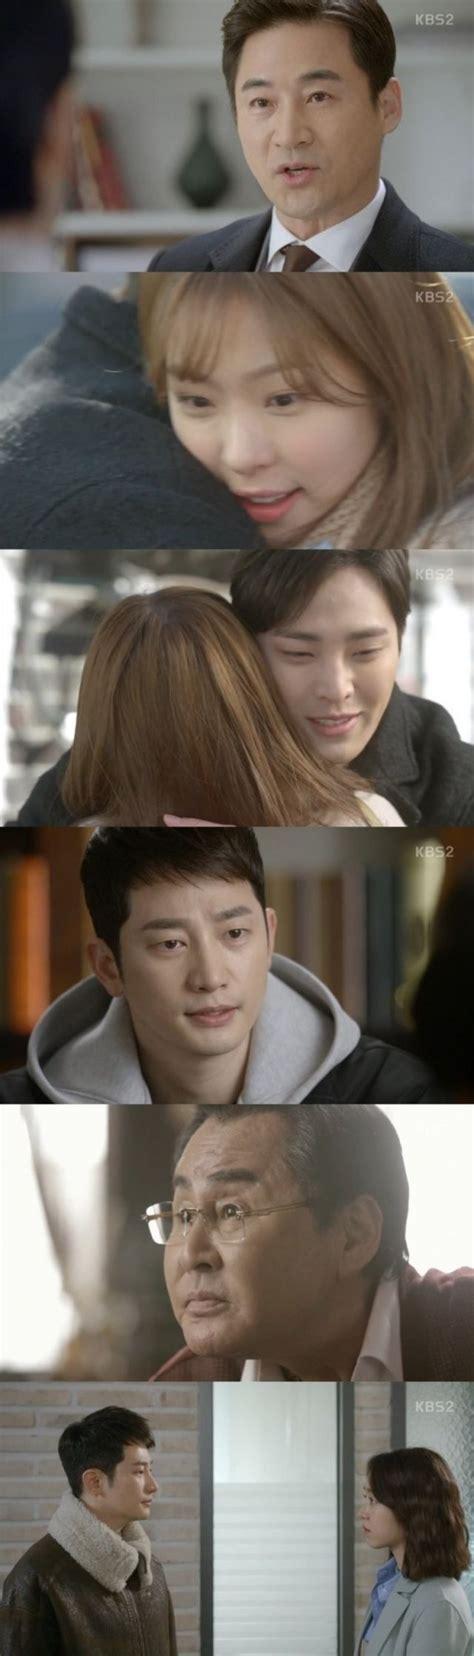 film korea my golden life spoiler added episodes 43 and 44 captures for the korean